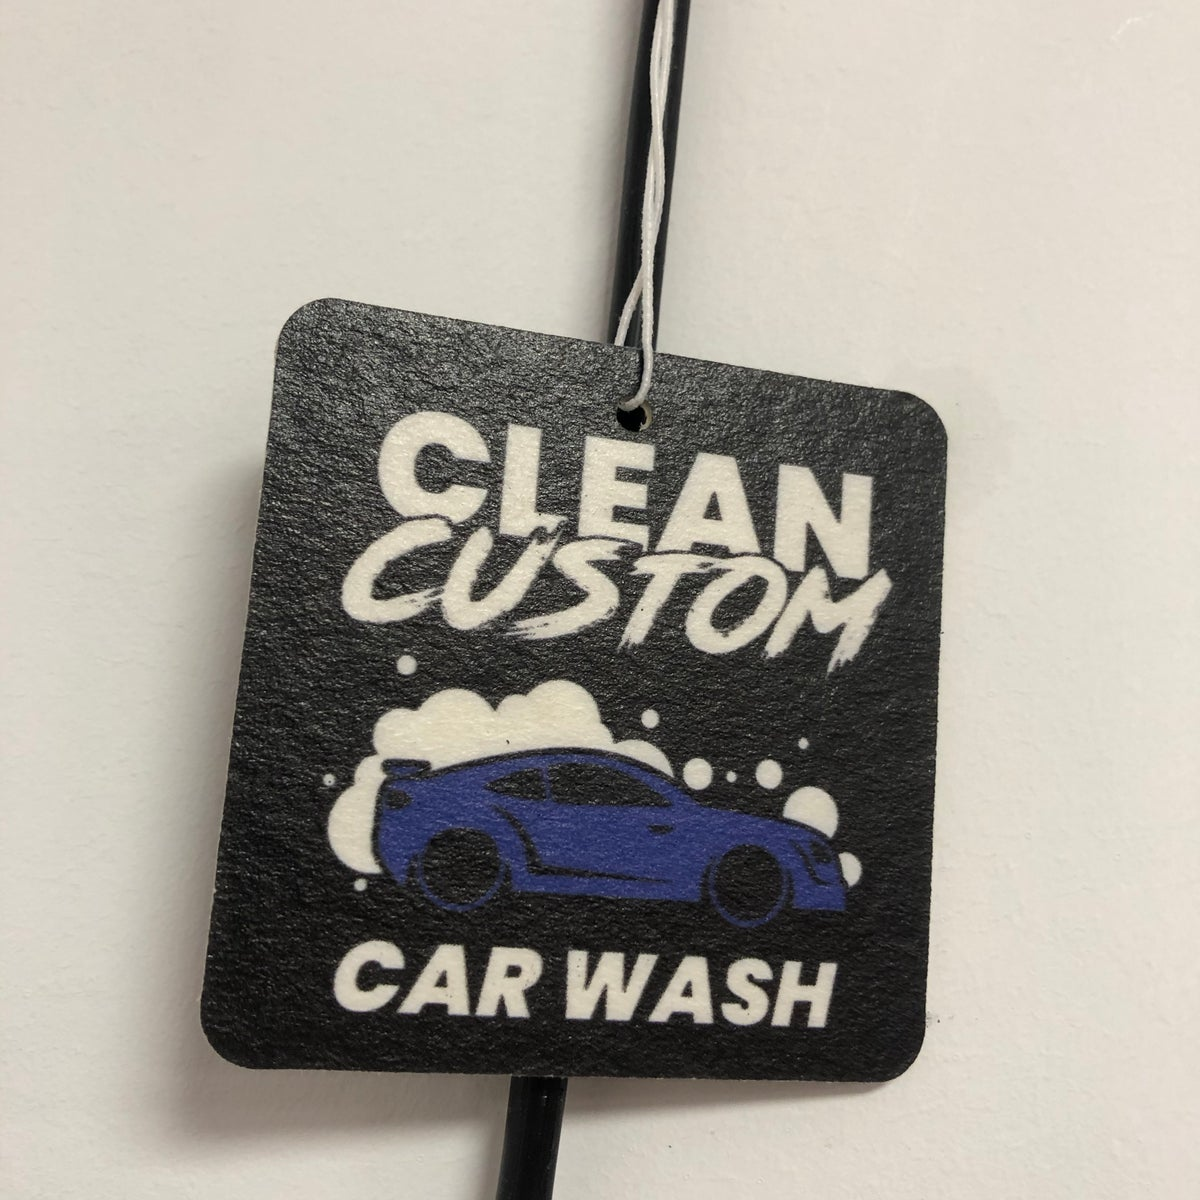 Image of CleanCustom Air Fresheners